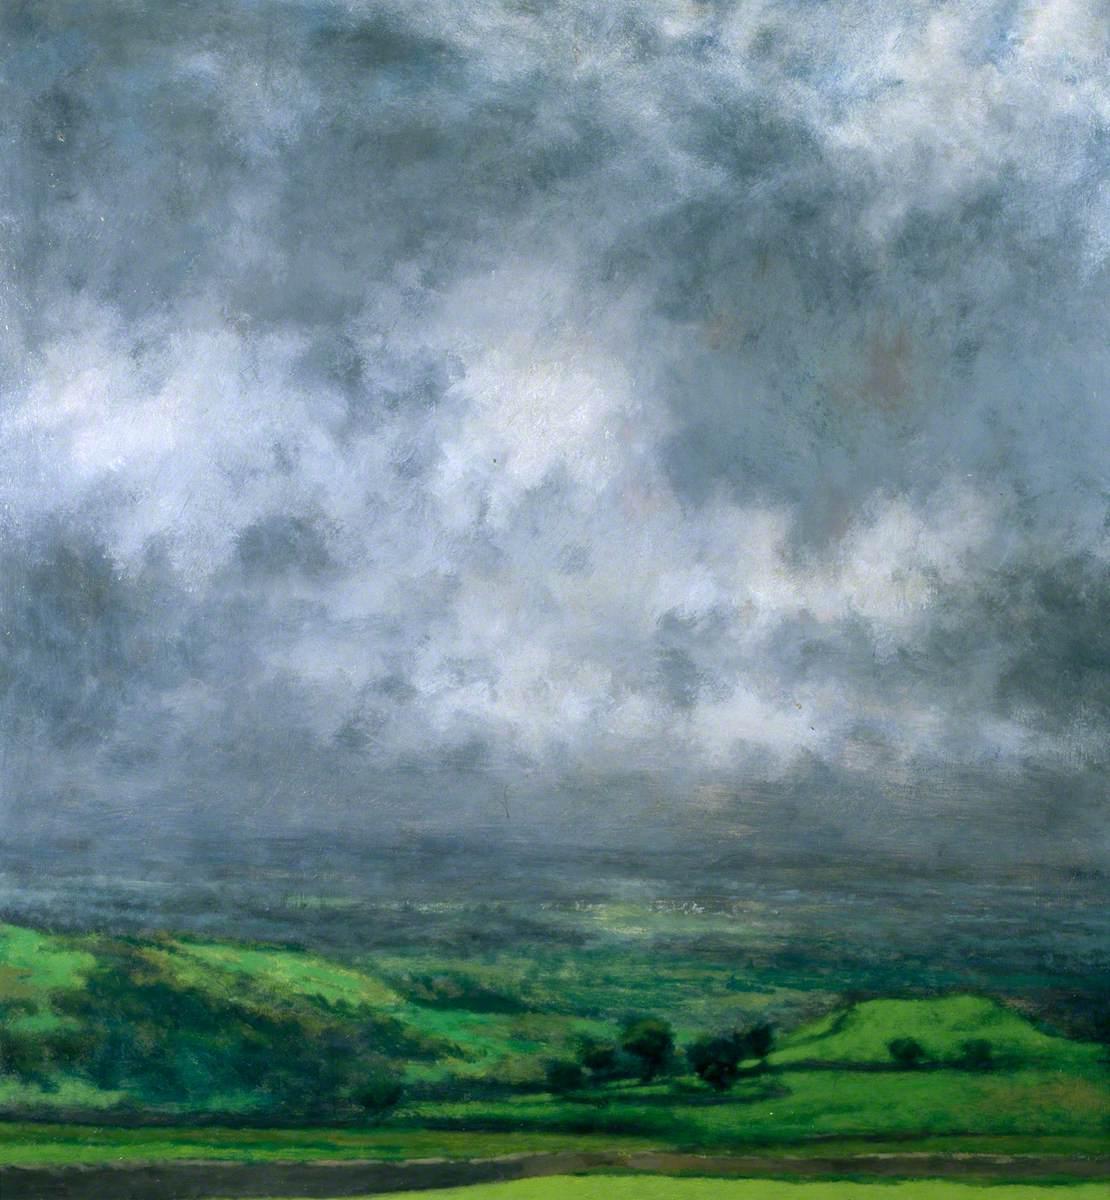 Rain Clouds Gathering, Autumn